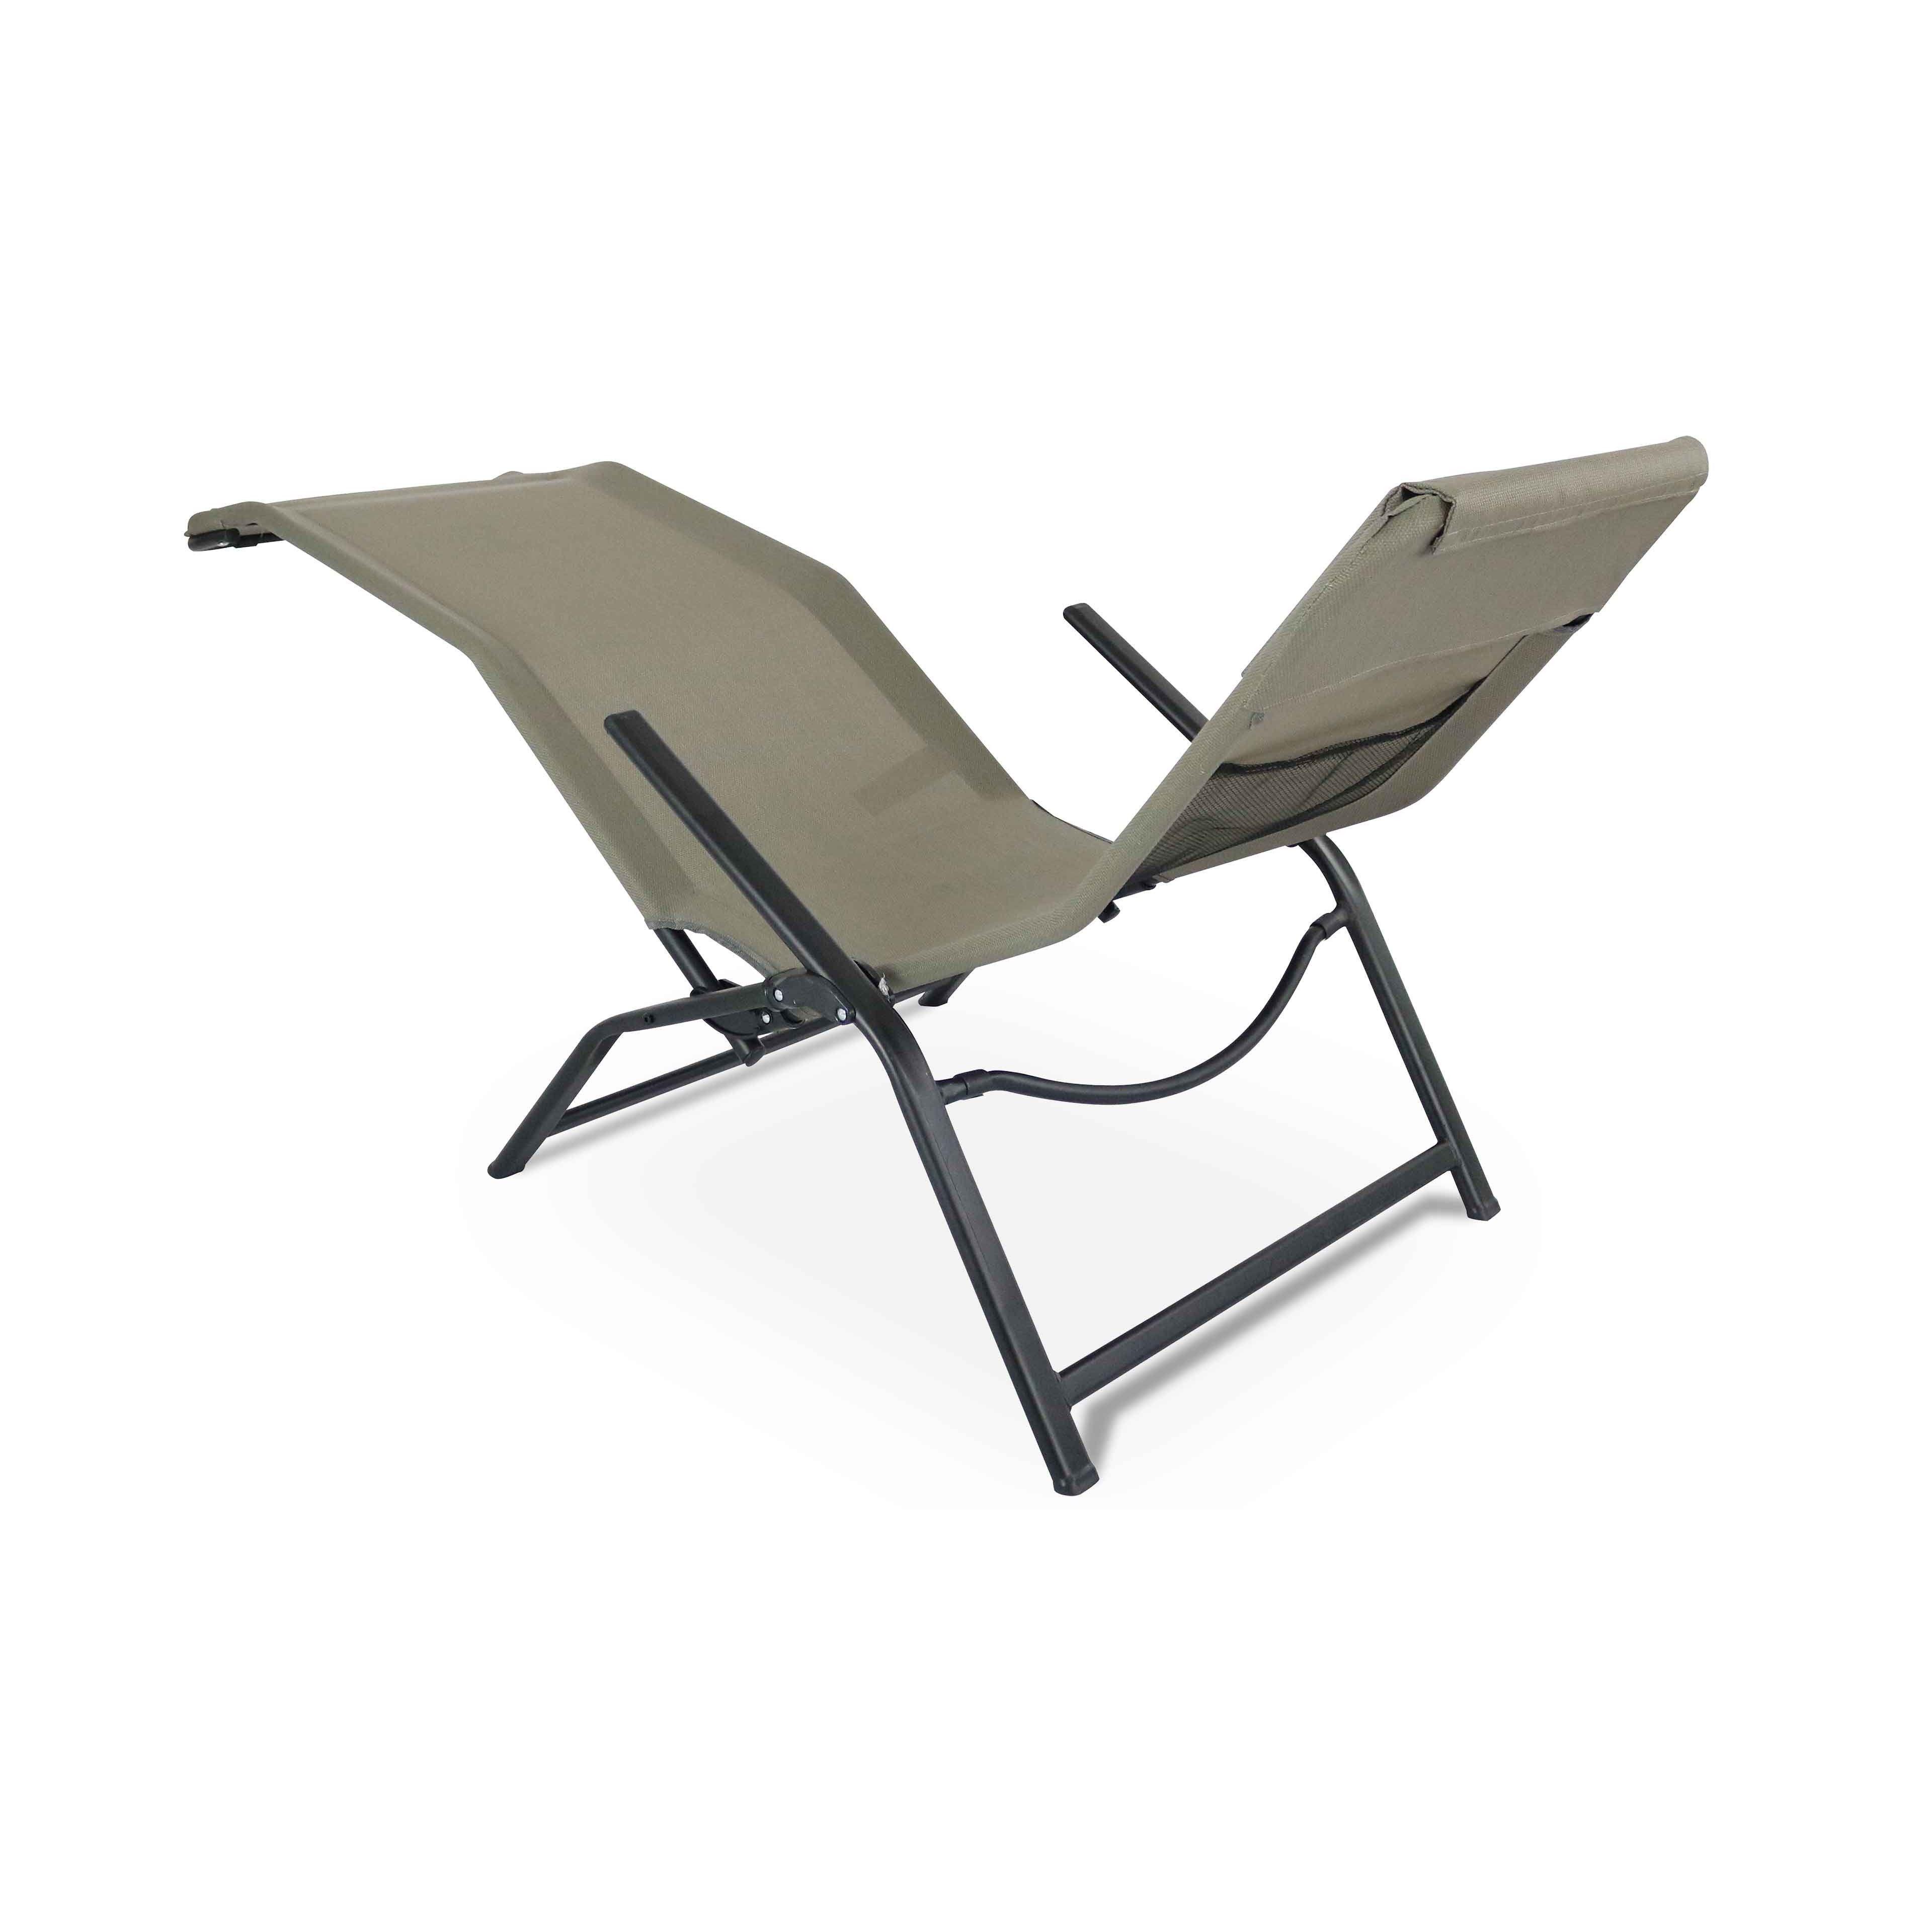 transat bascule pas cher. Black Bedroom Furniture Sets. Home Design Ideas